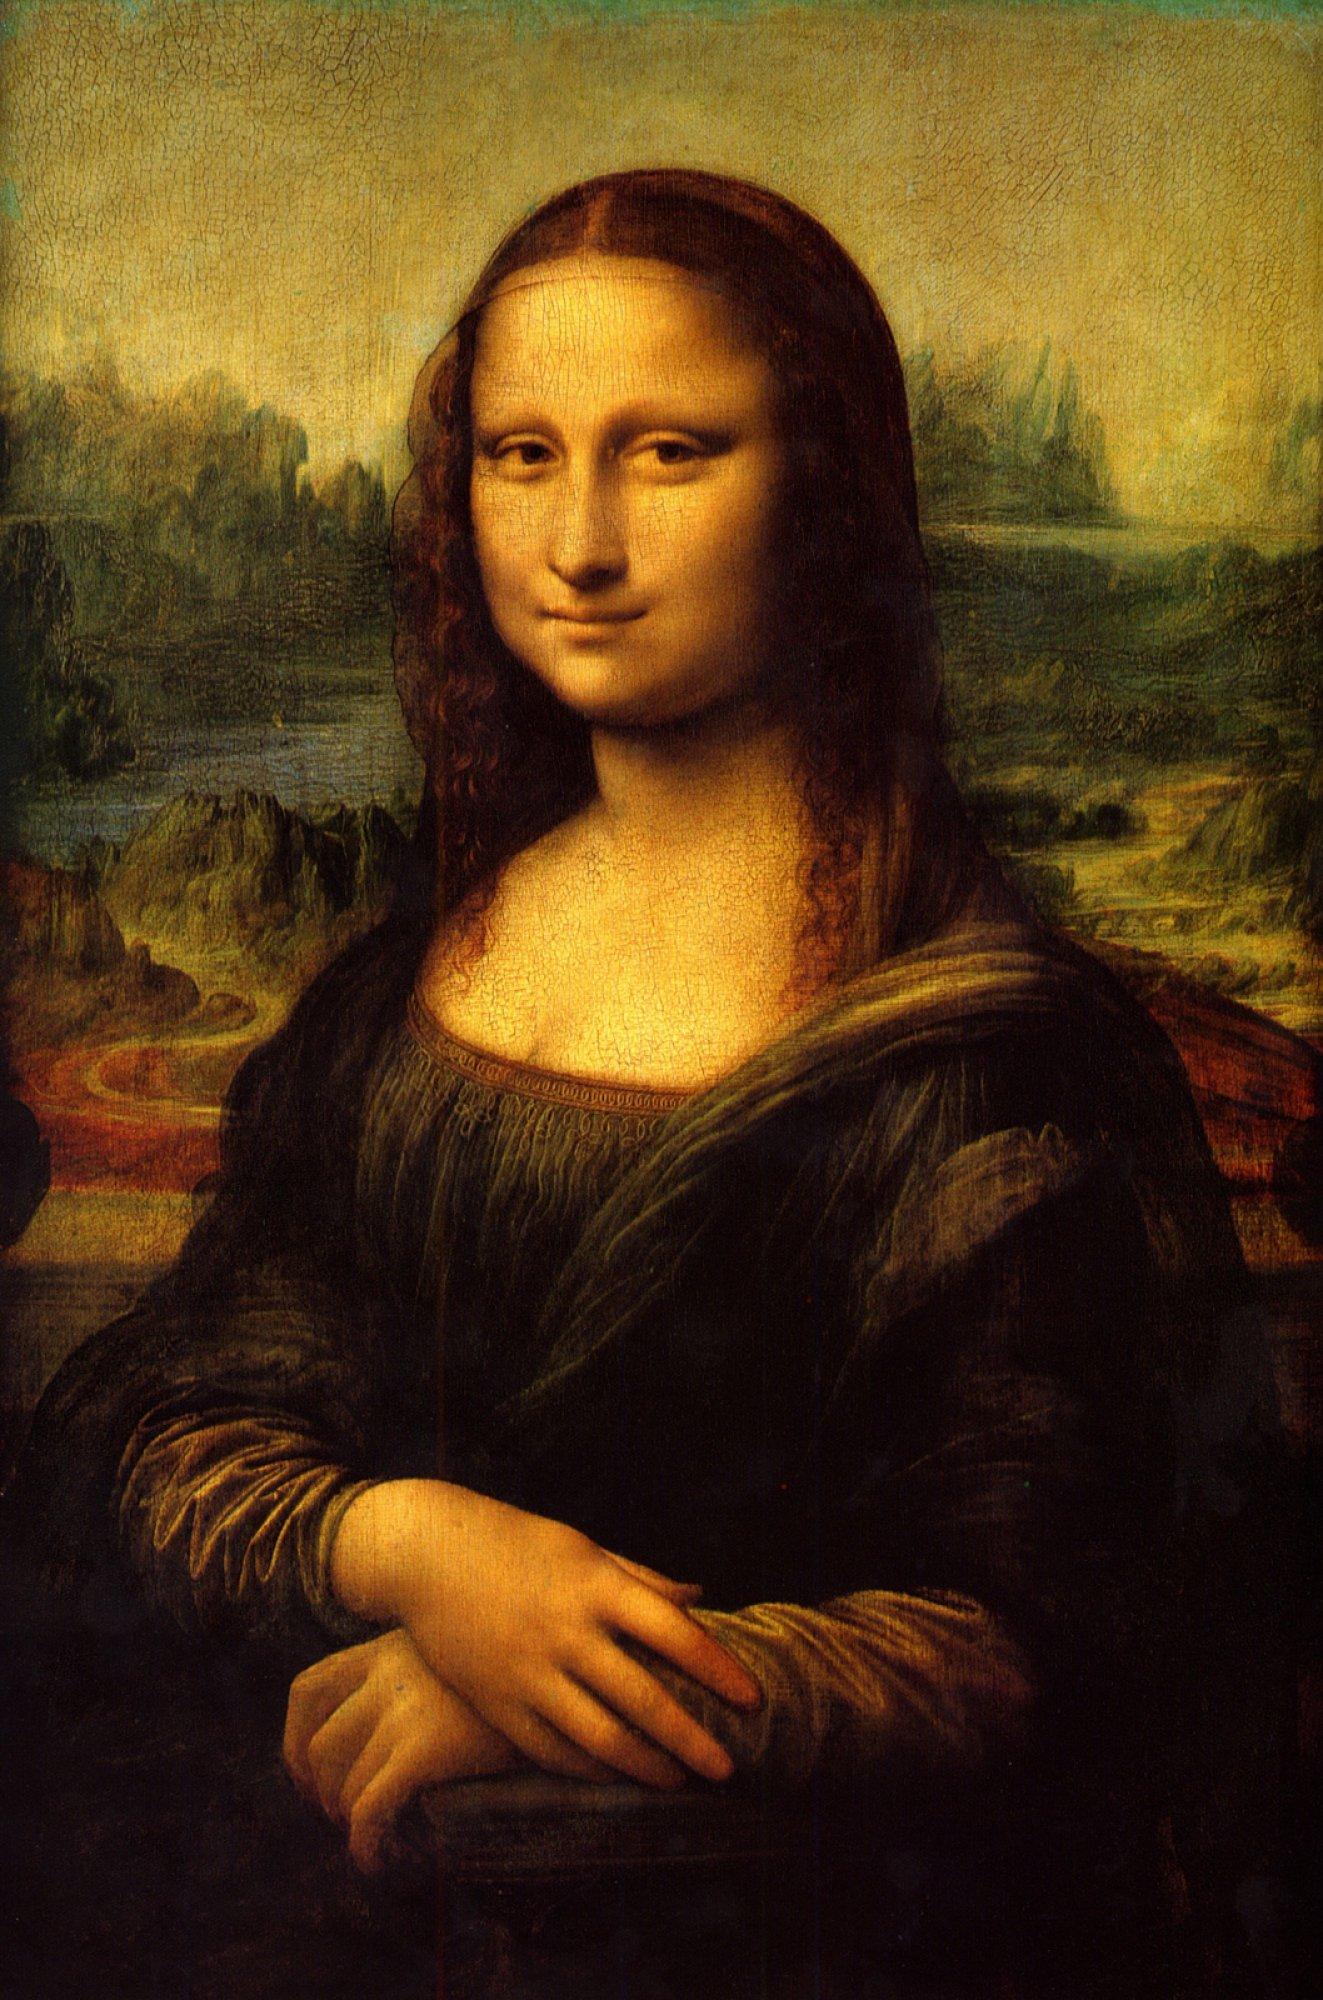 https://bubo.sk/uploads/galleries/7350/wikipedia-mona-lisa.jpg